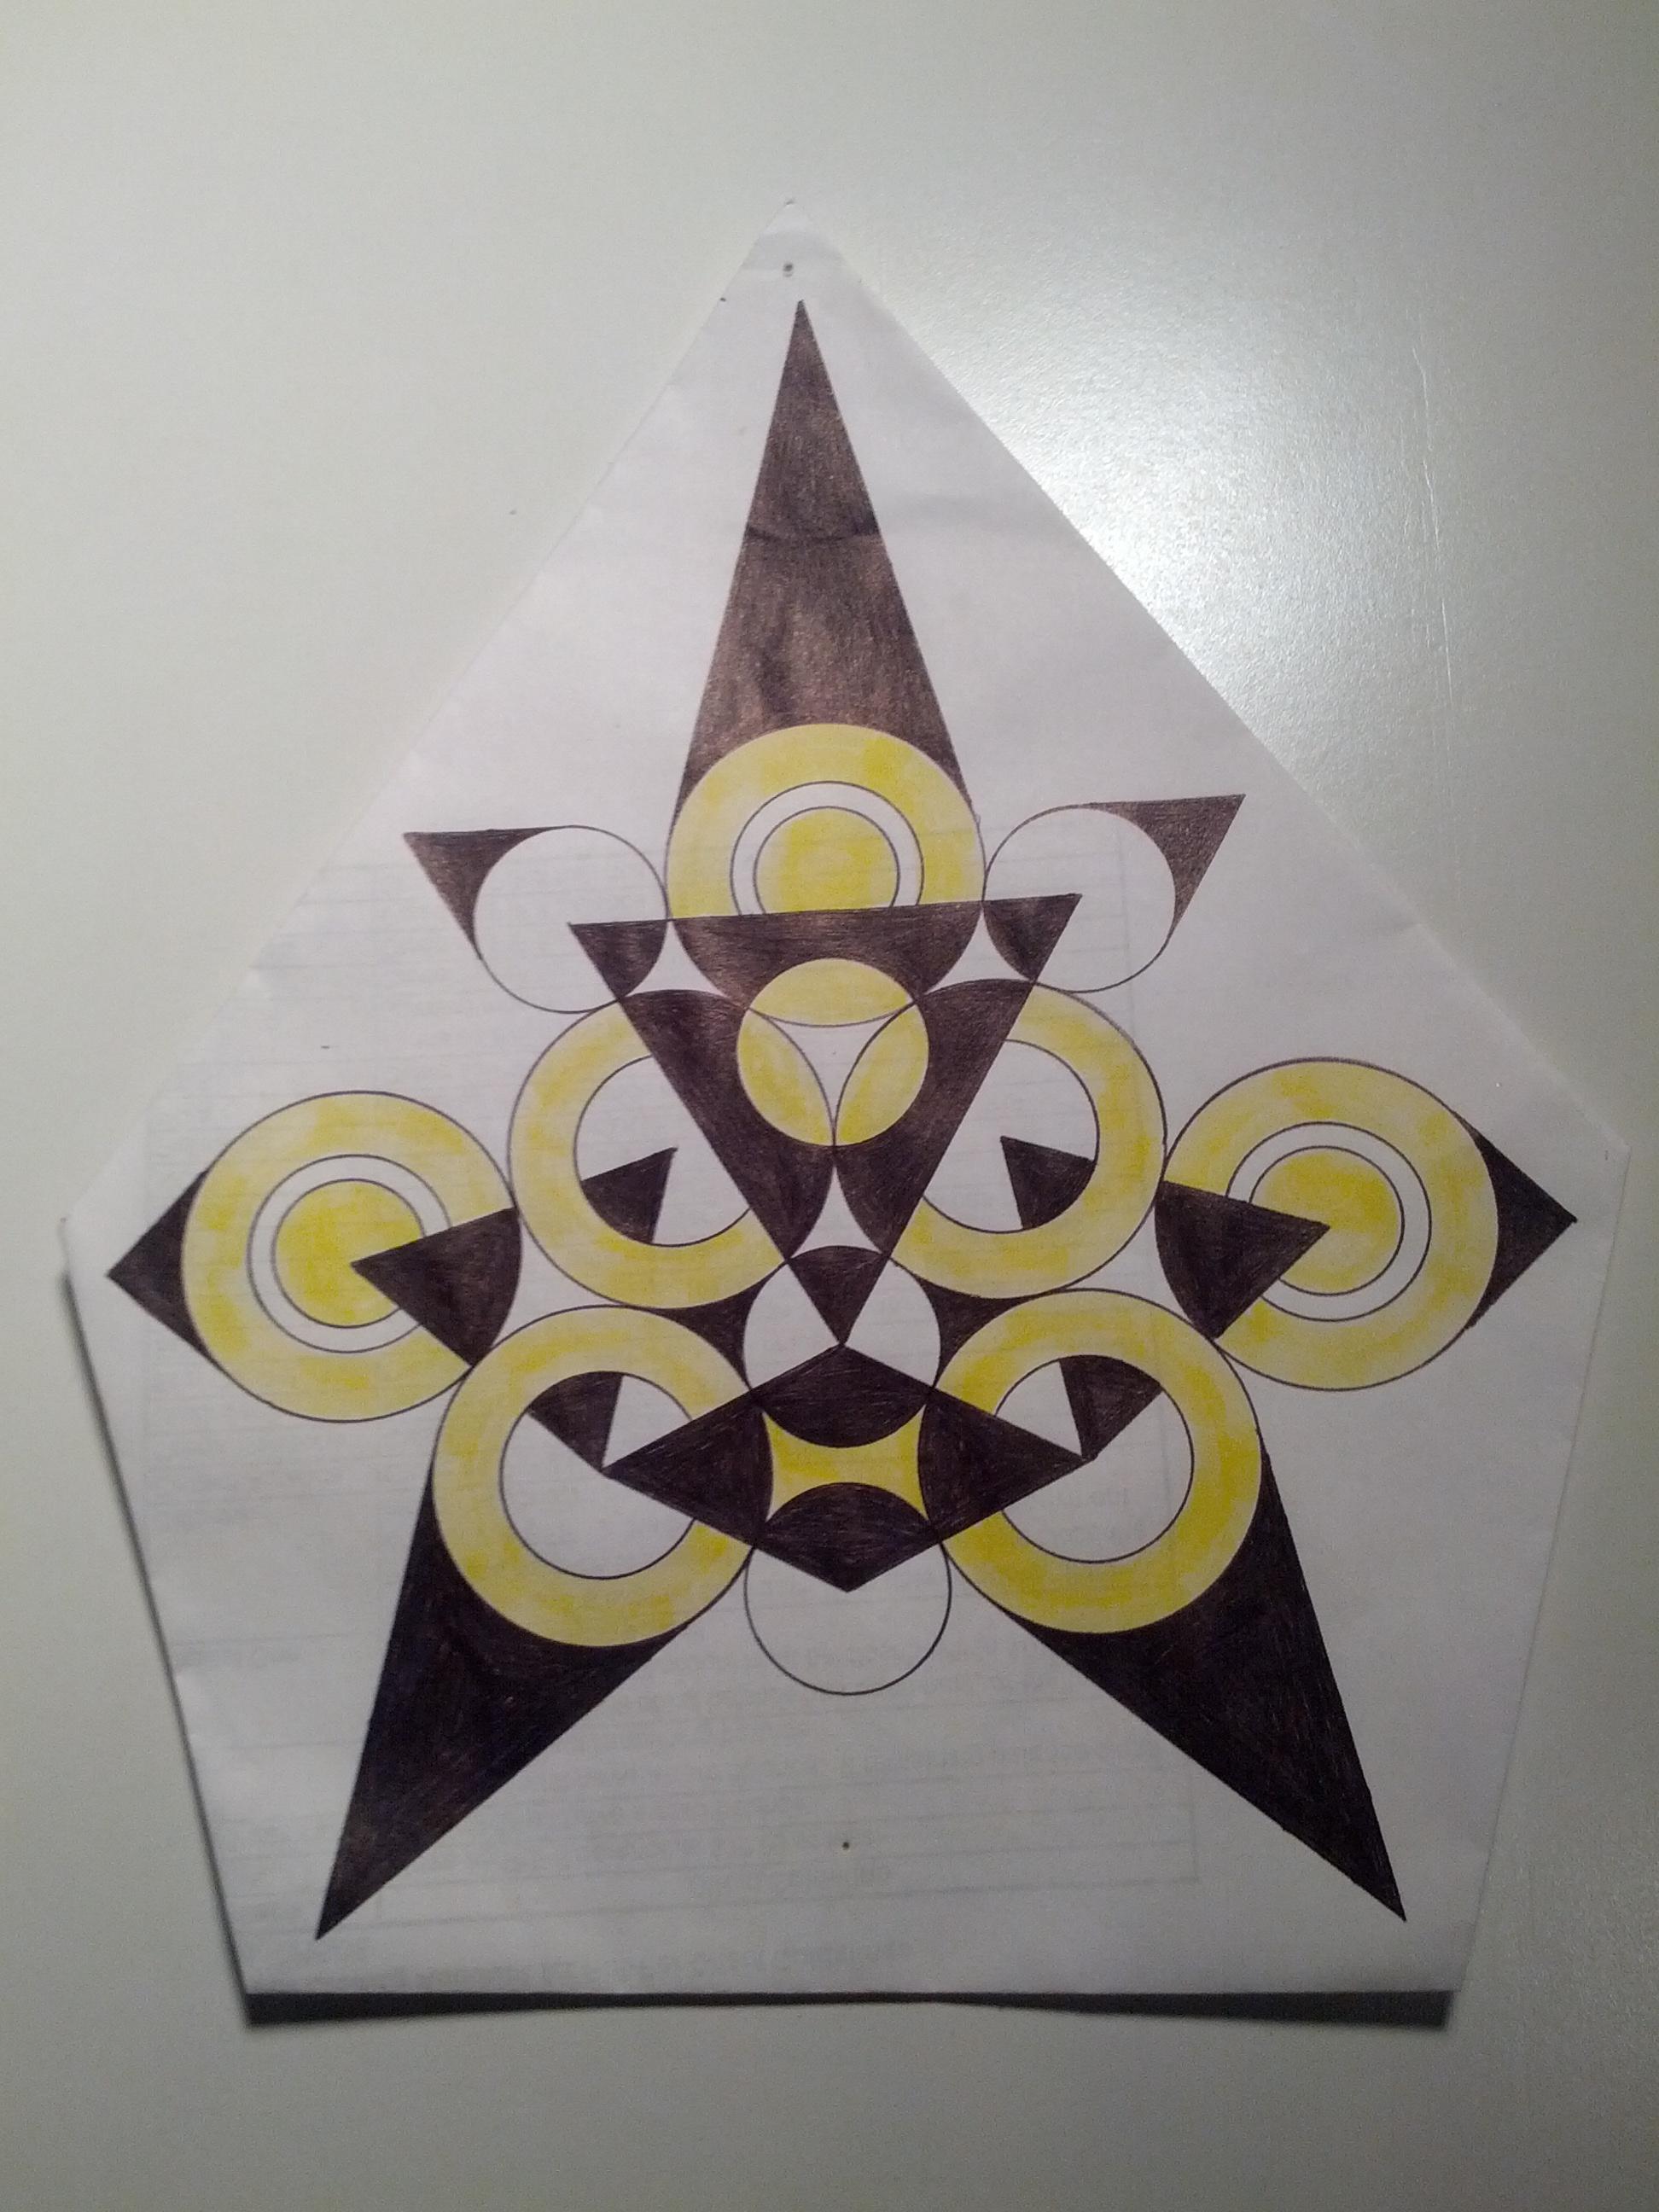 Triangular Unfolding